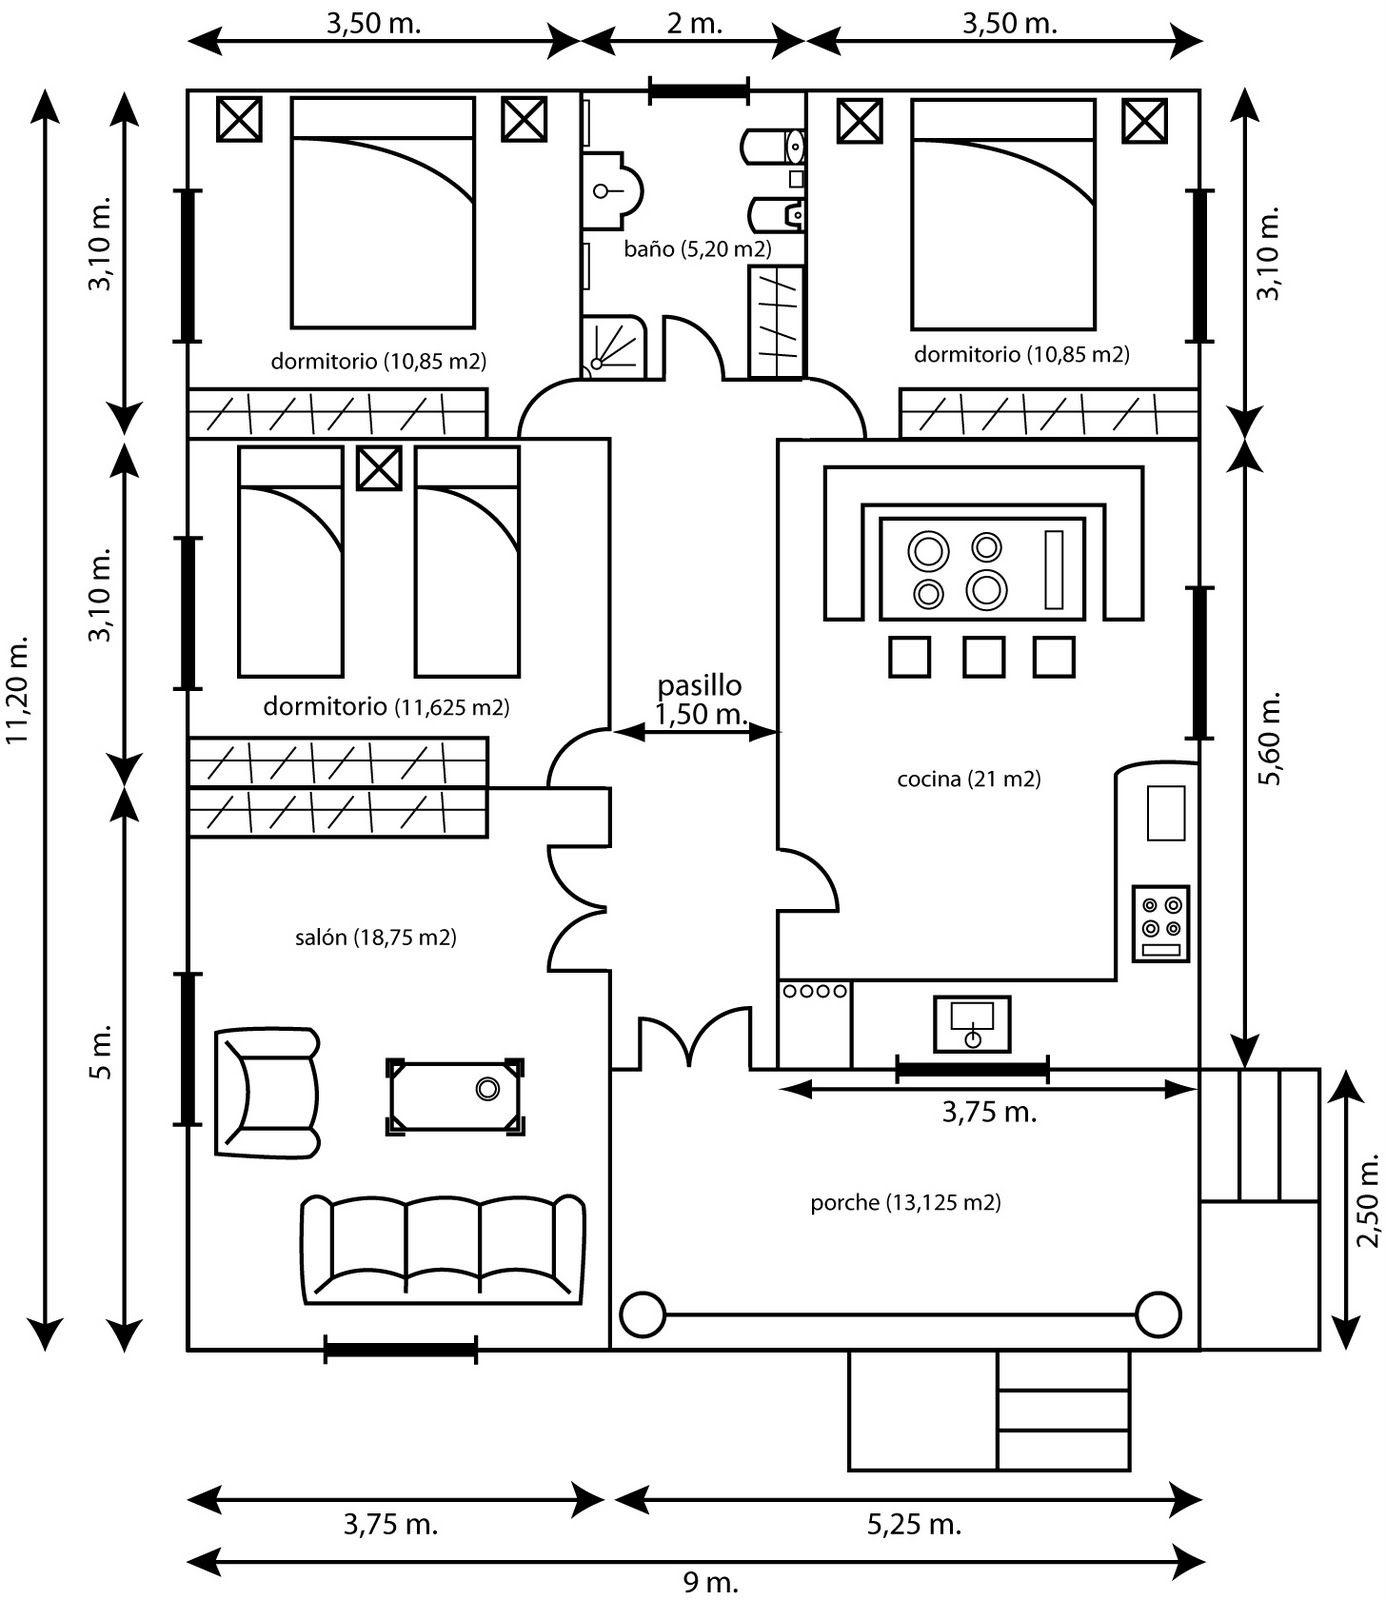 Plano casa 1386 1600 construcci n for Plano construccion casa